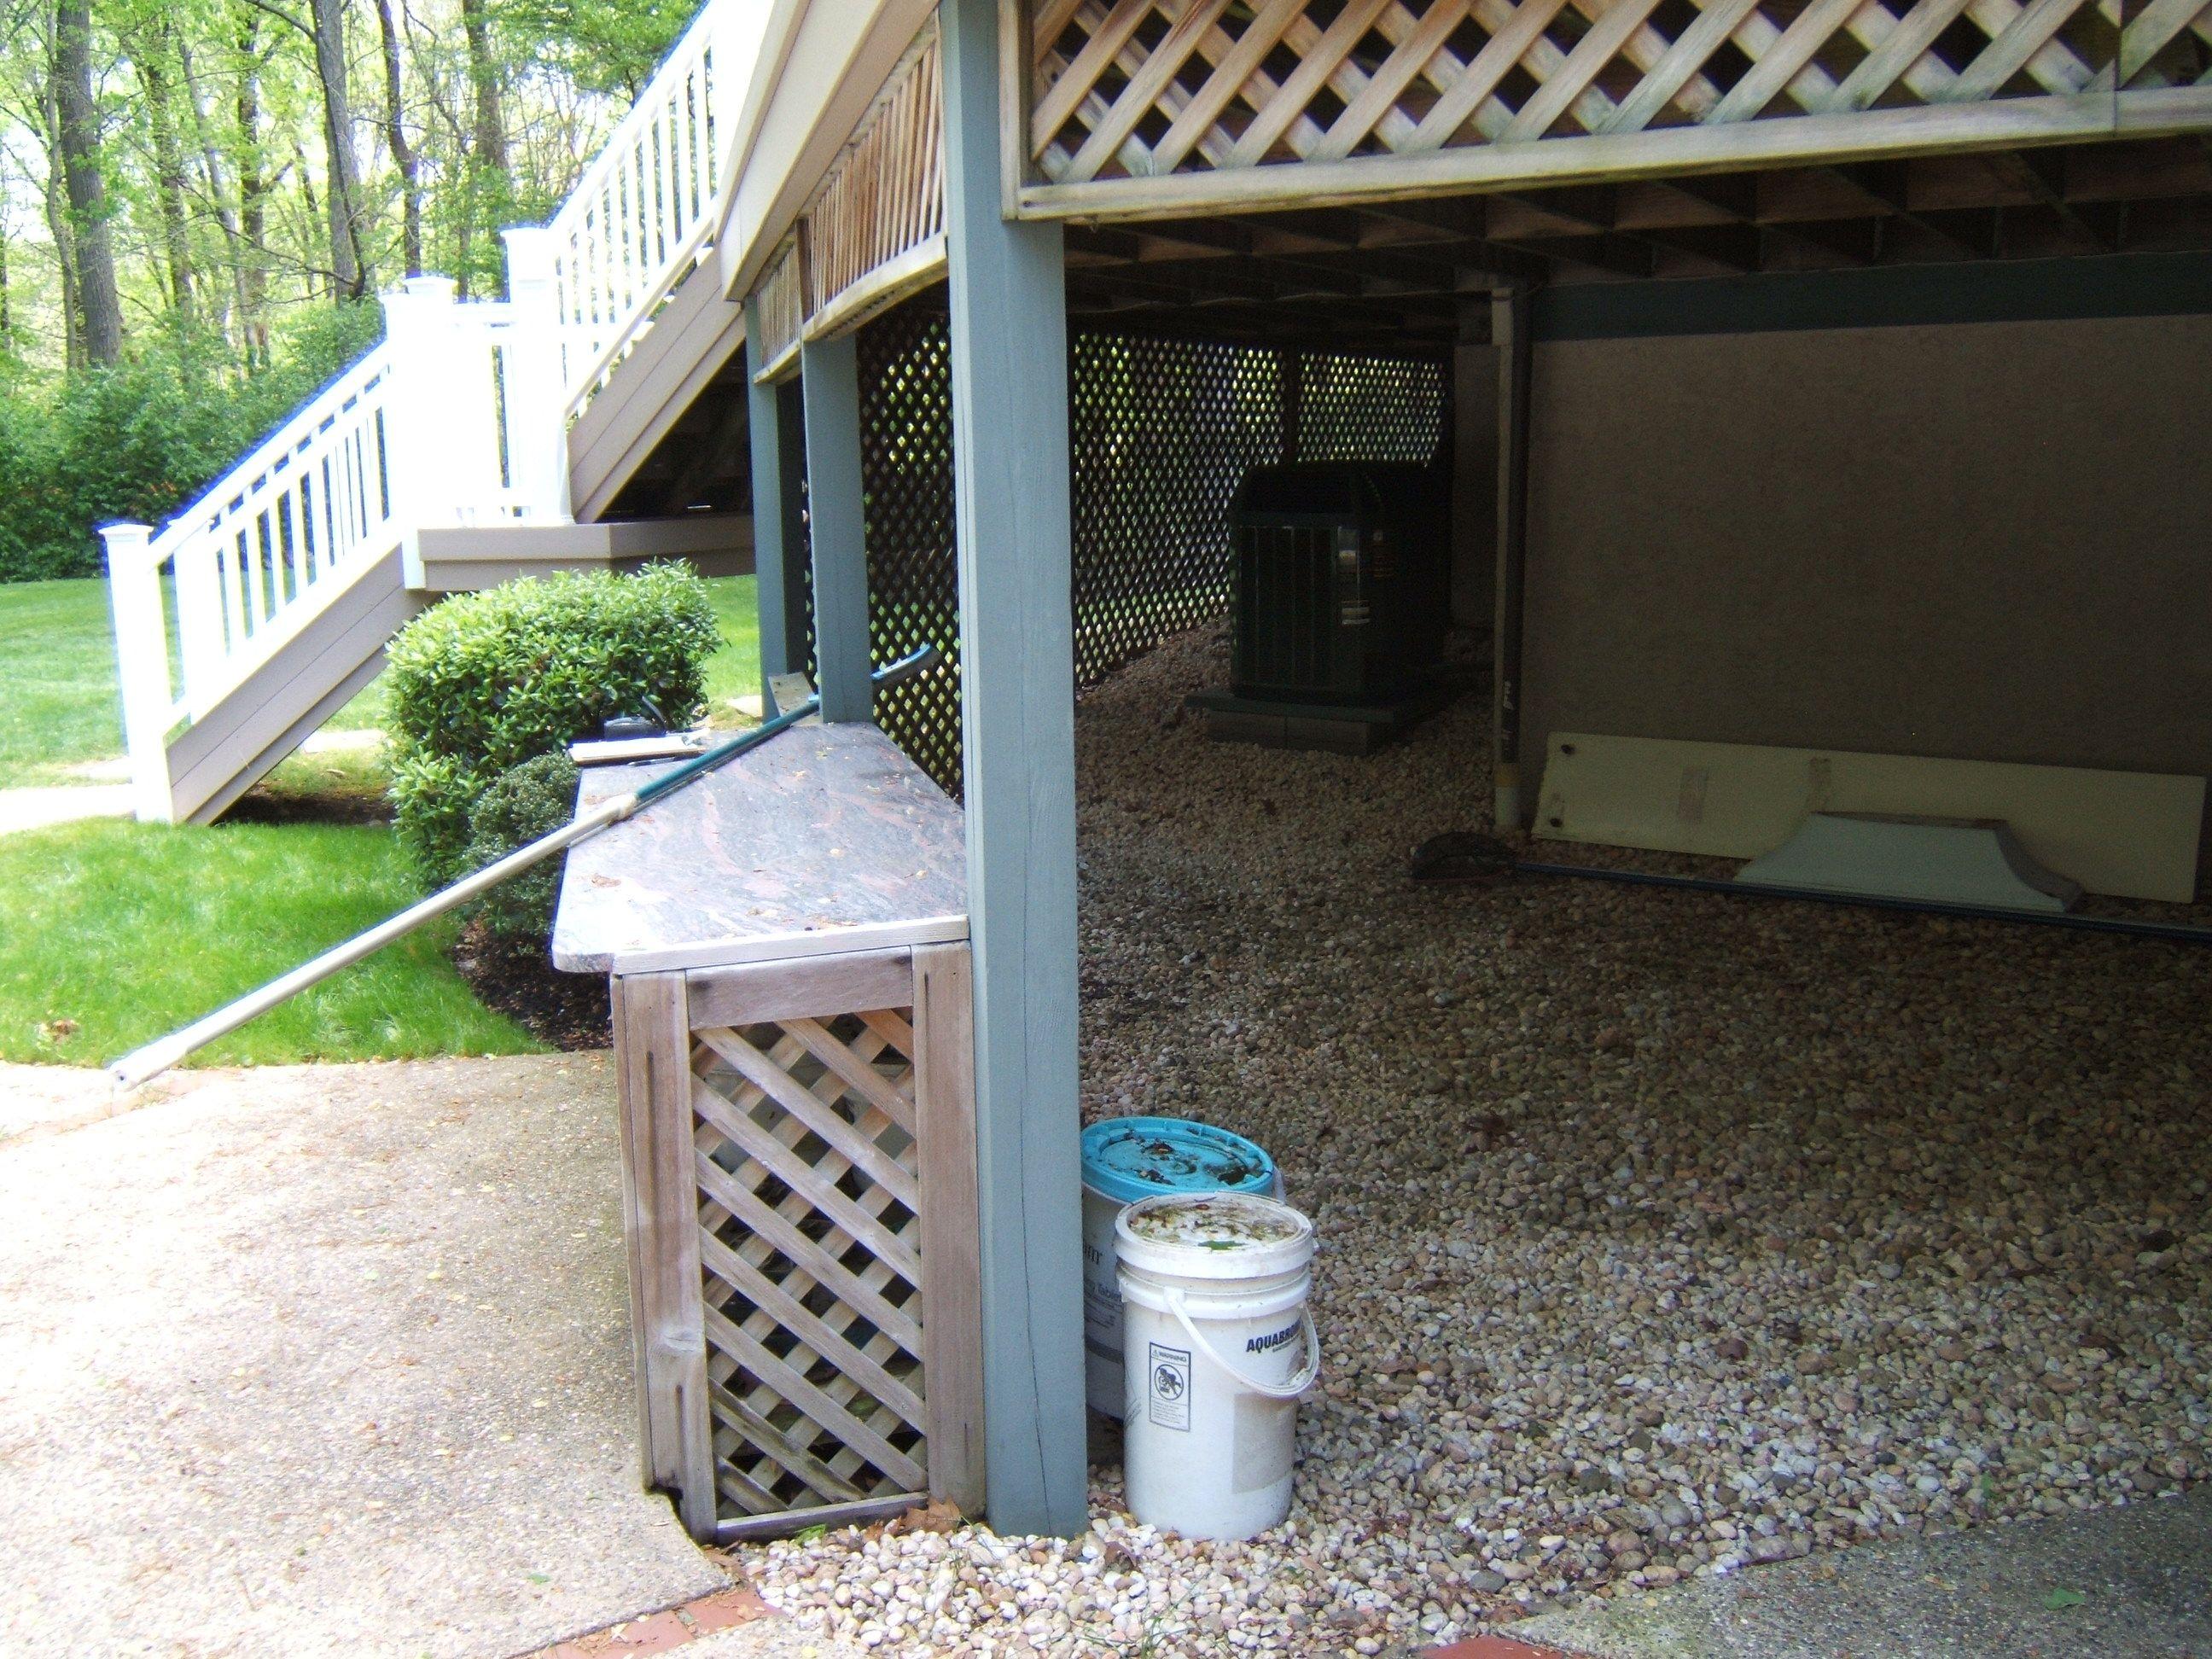 113 best deck and under deck space images on pinterest patio dry under deck storage ideas bing images baanklon Choice Image